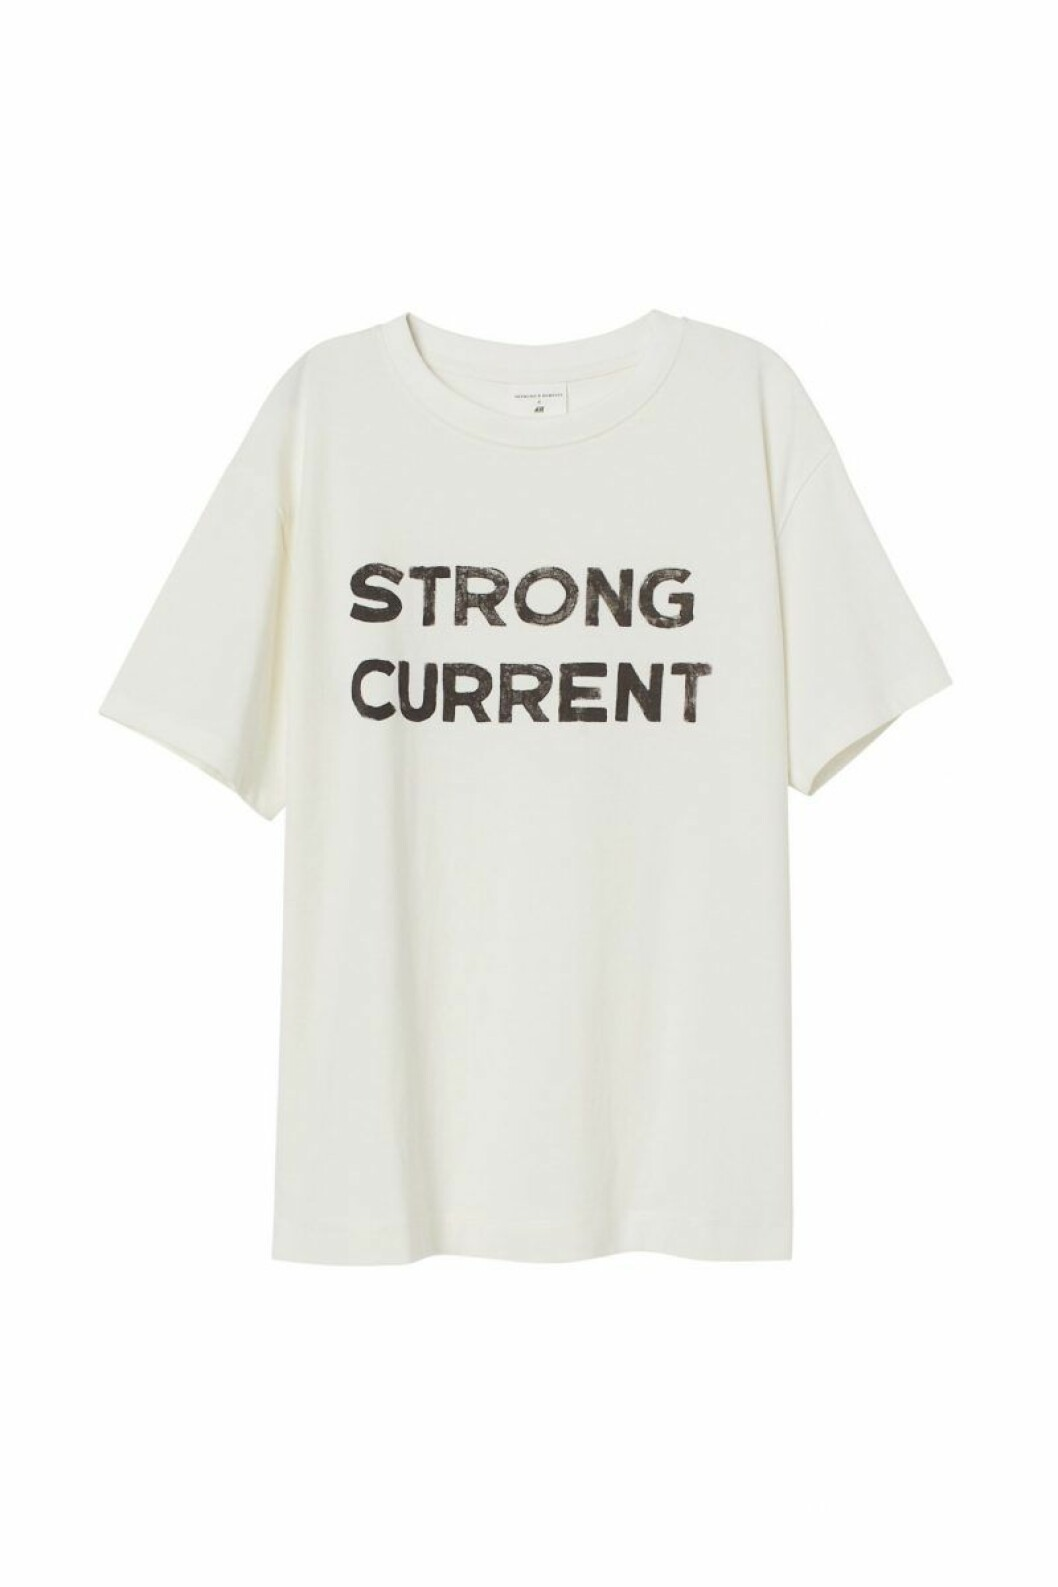 H&M x Desmond & Dempsey sommarkollektion 2020: Vit t-shirt